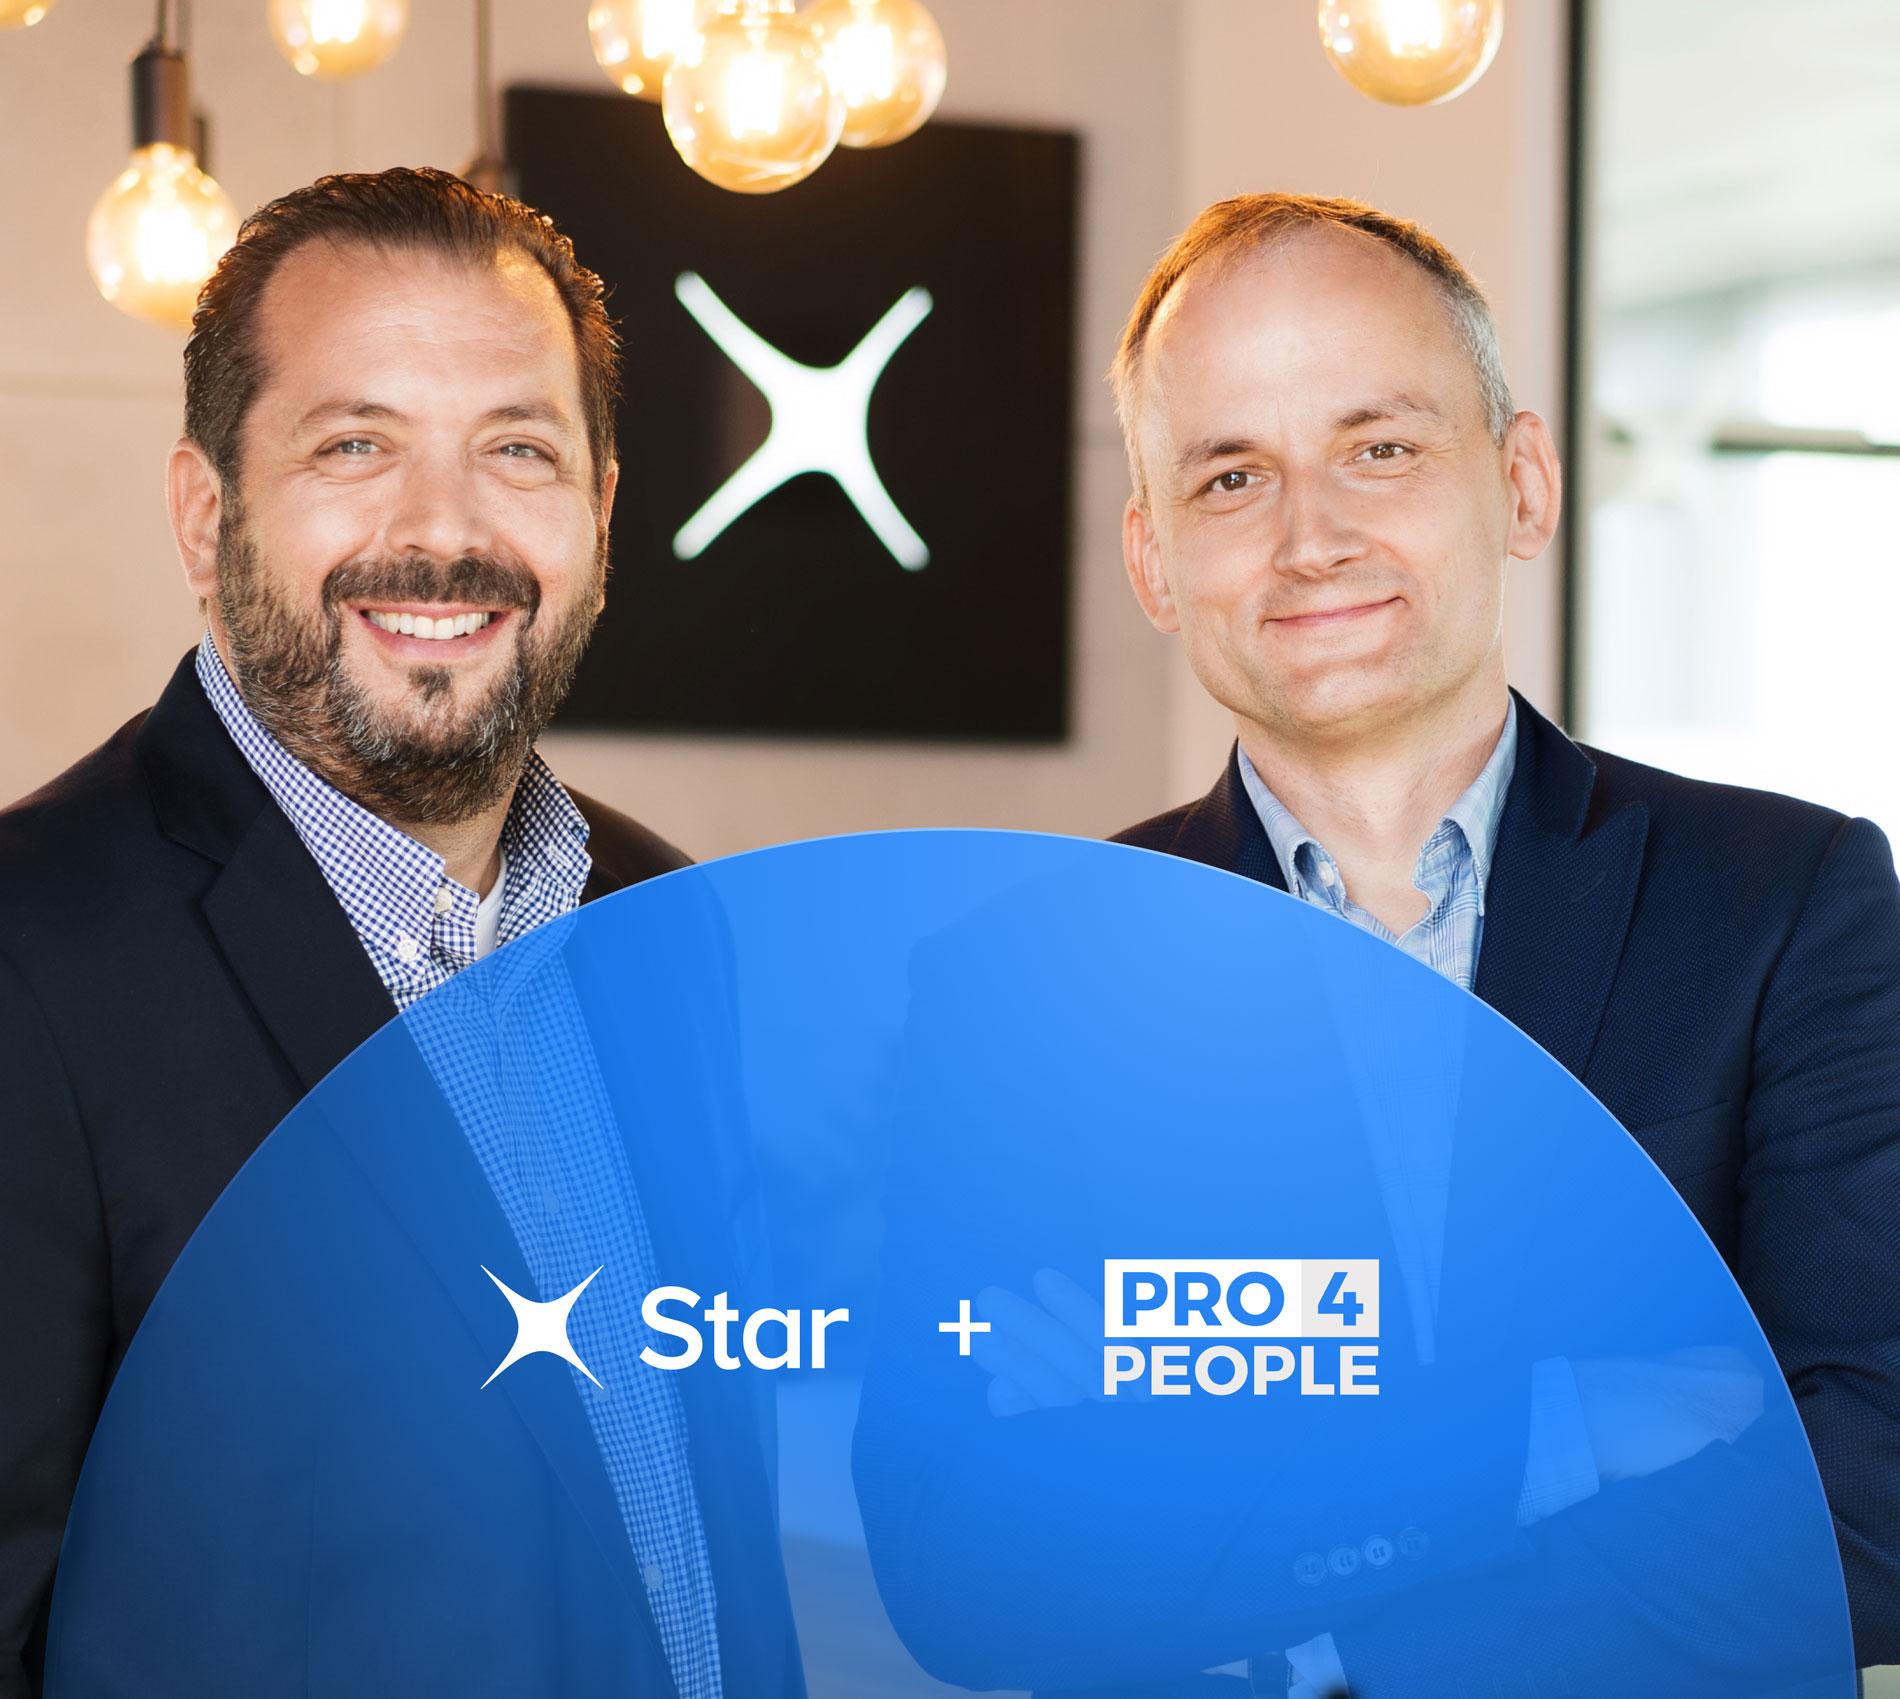 Star - Pro 4 People